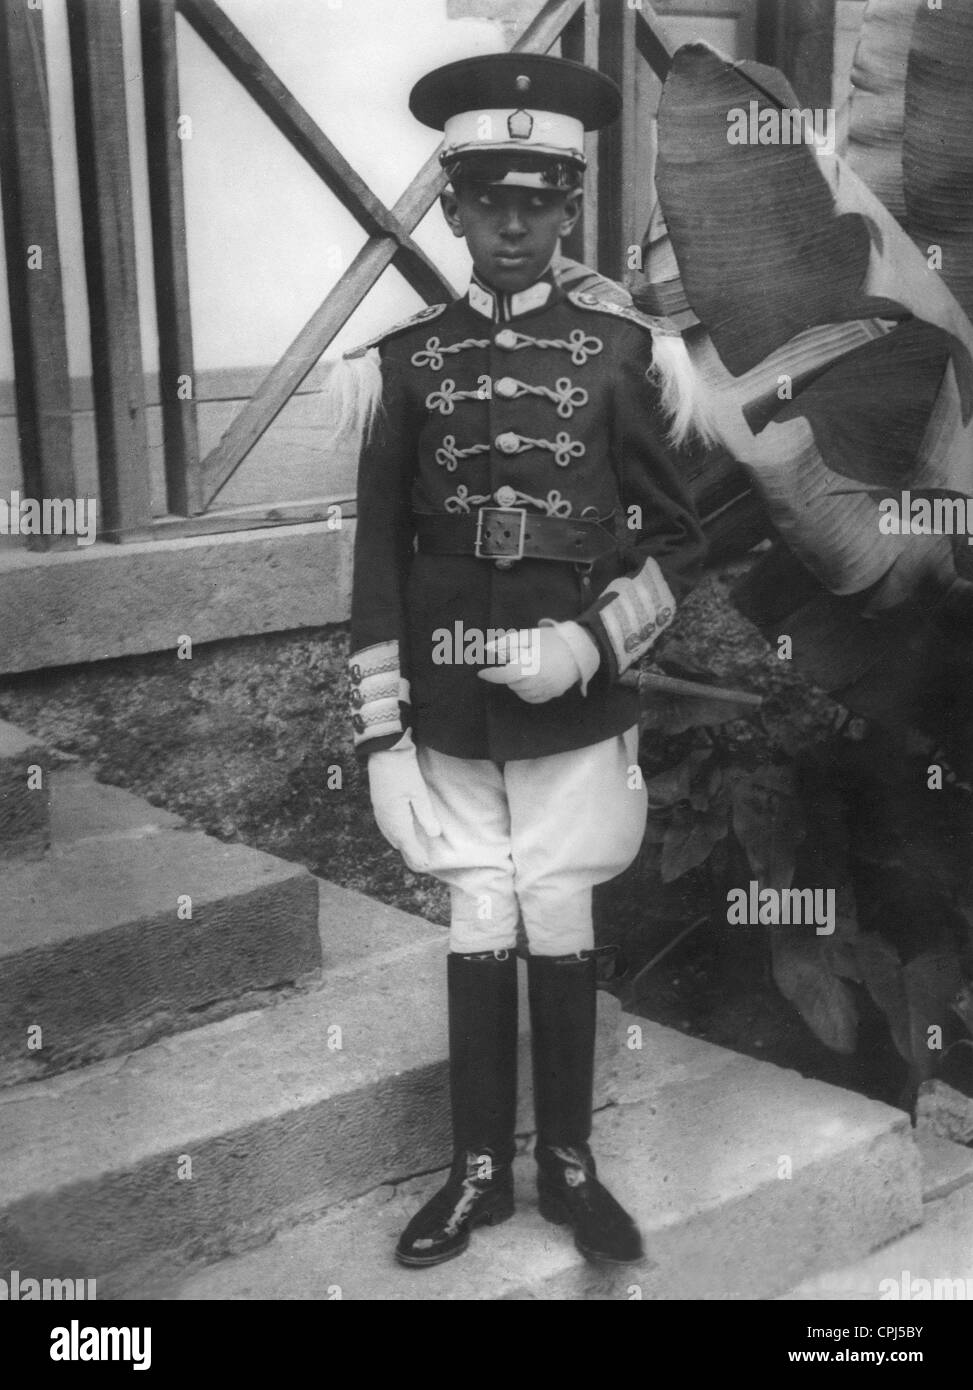 Prince Makonnen in a dress uniform - Stock Image